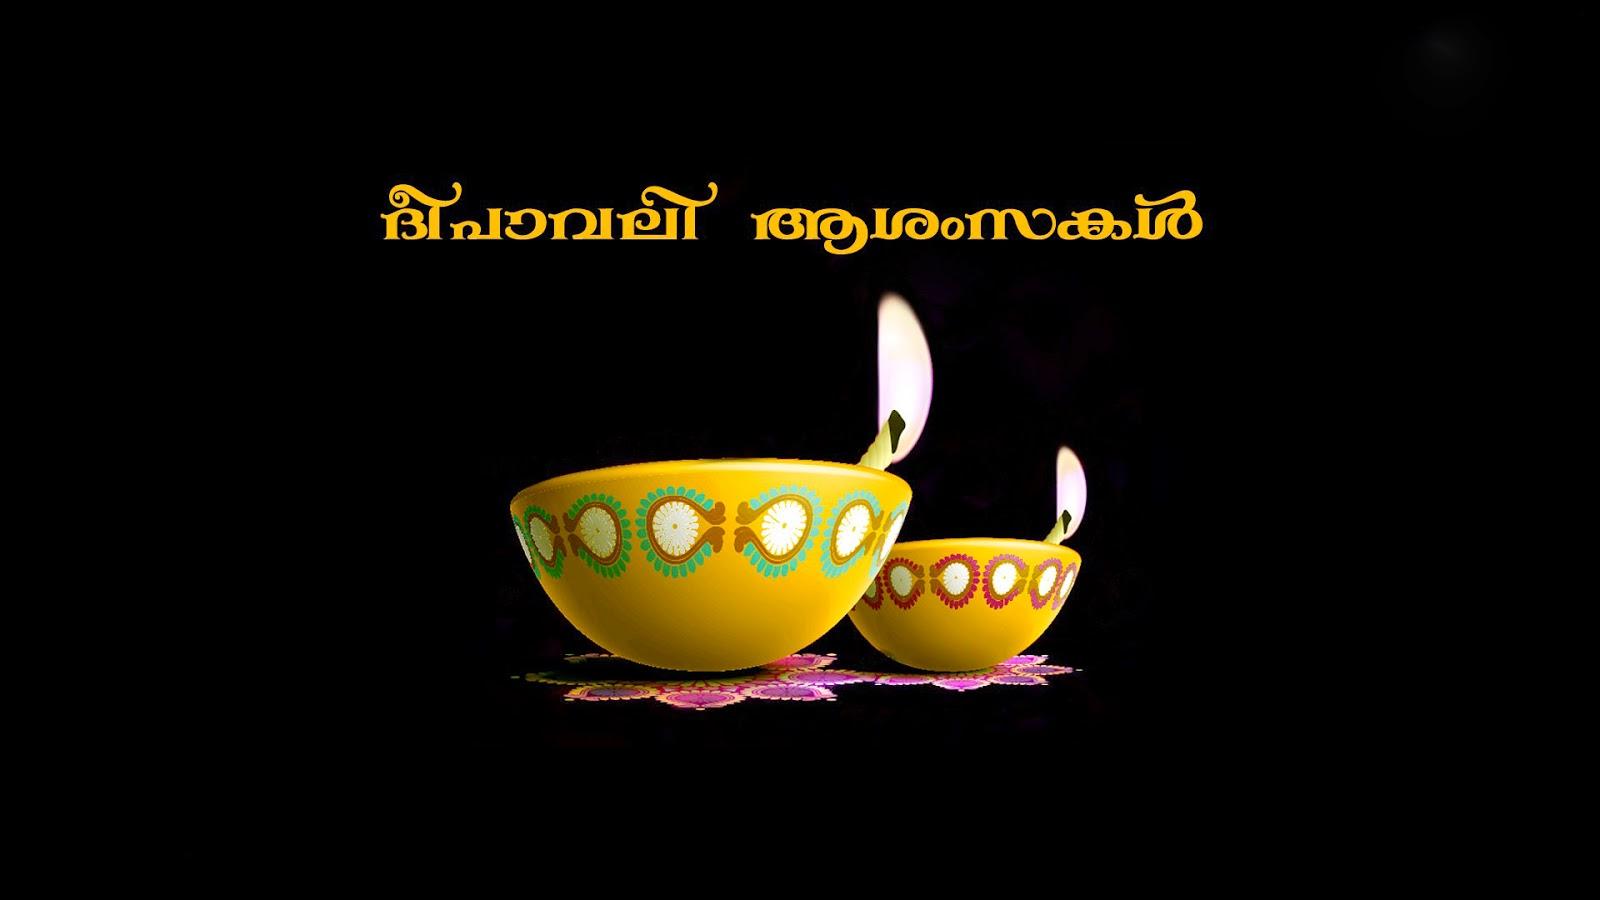 Happy Diwali 2015 Diwali Festival 2015 Wallpapers Sms Videos